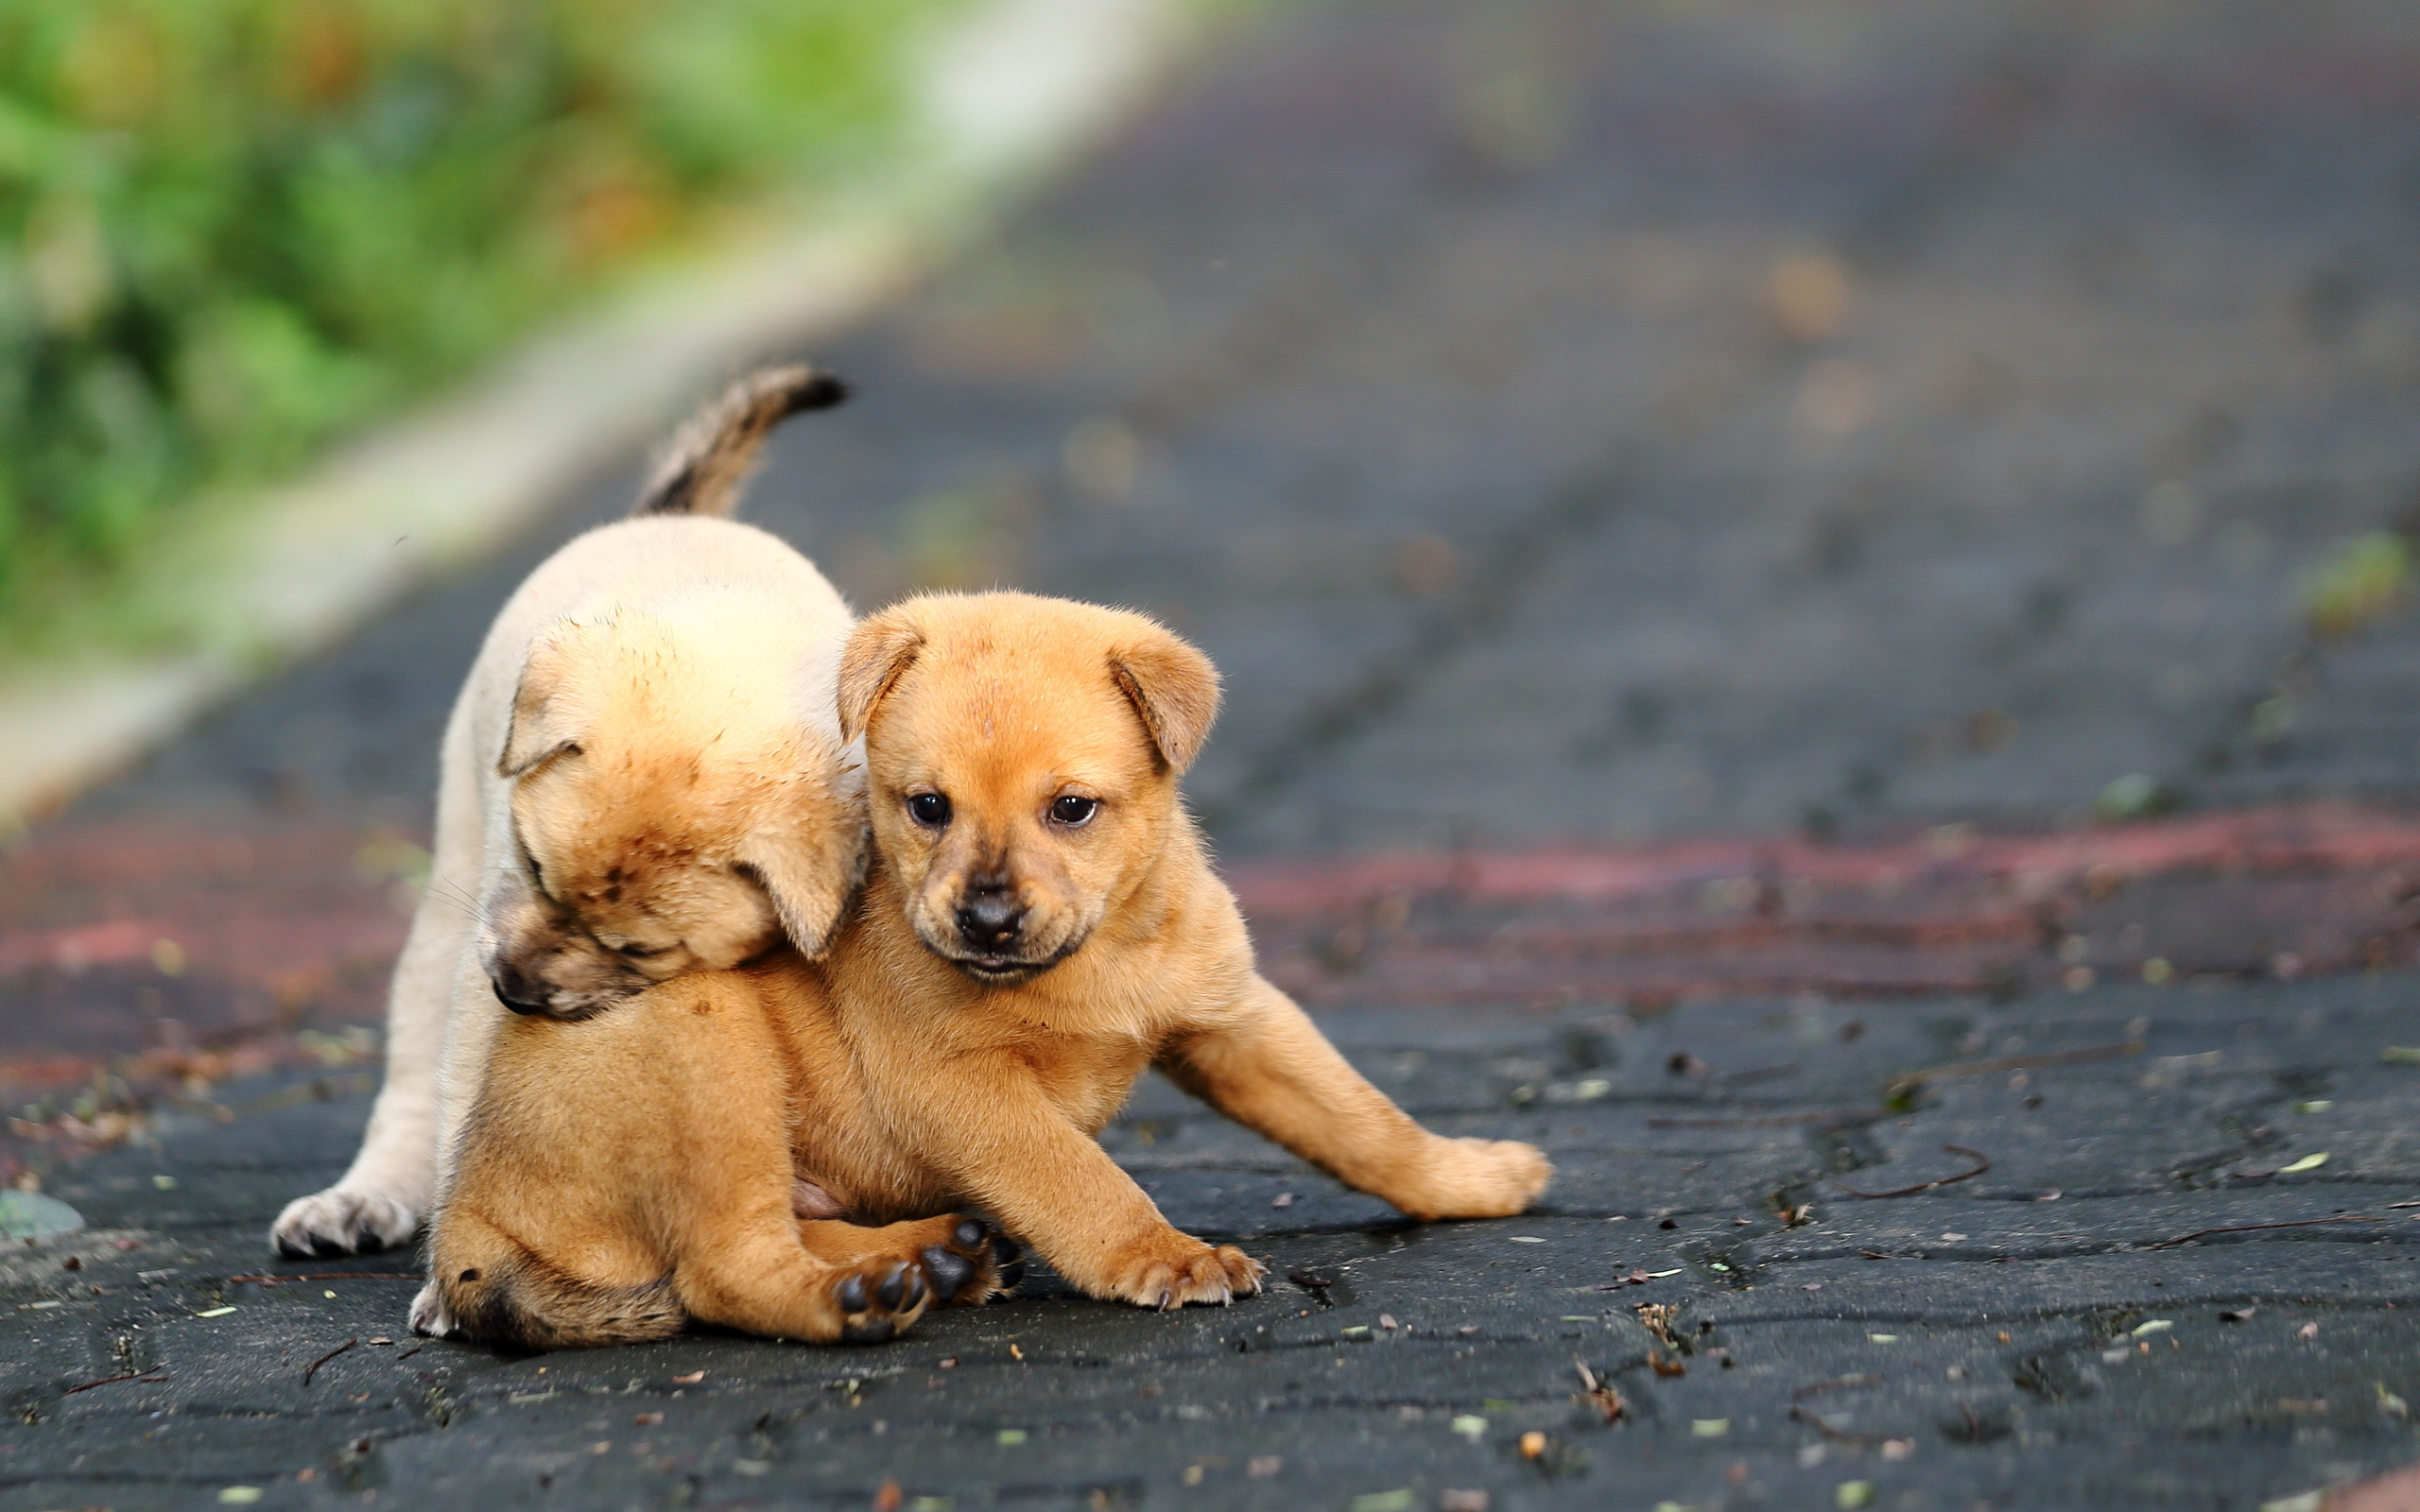 cute puppy videos